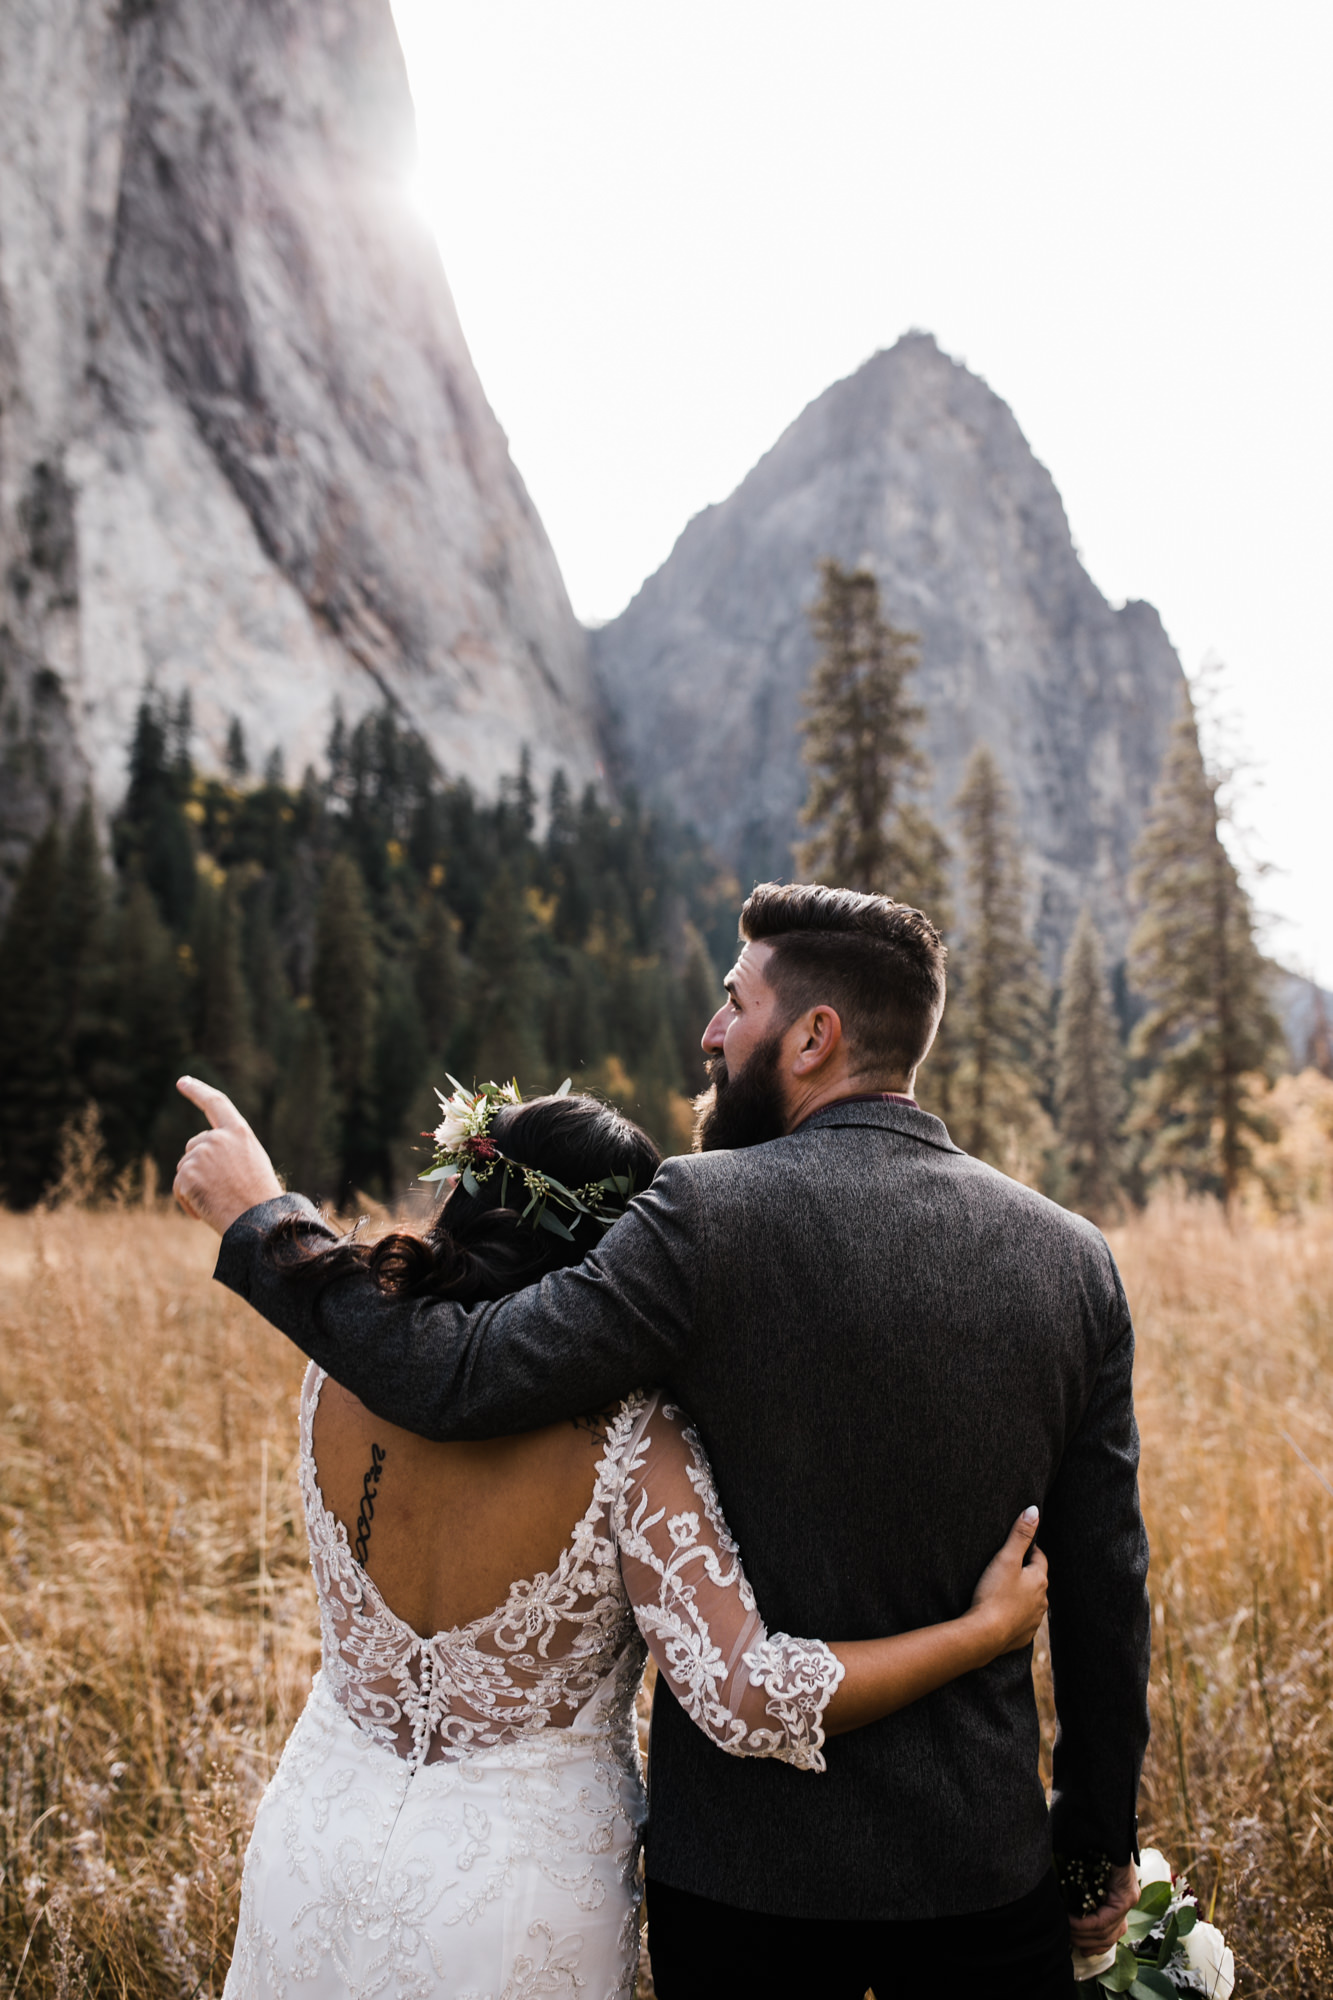 intimate fall wedding in yosemite national park | destination adventure wedding photographers | the hearnes adventure photography | www.thehearnes.com